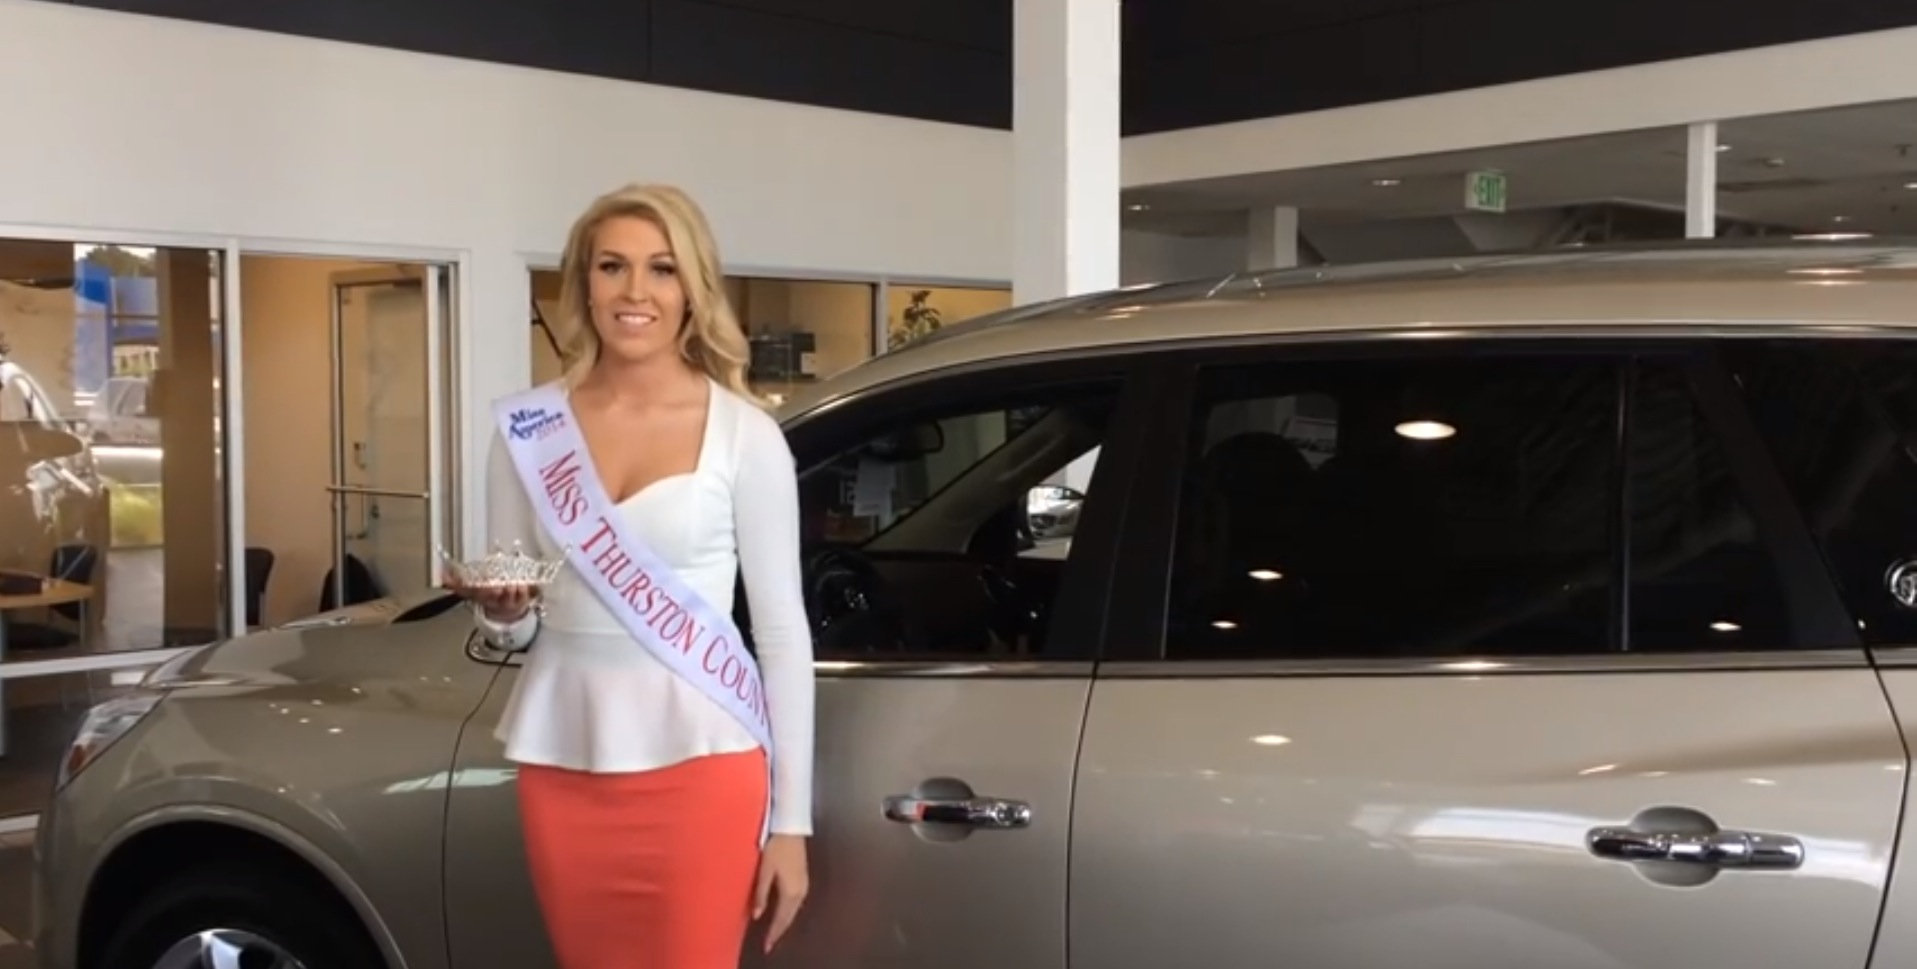 Cadillac Dealership Uses Miss Washington Pageant Girls to ...